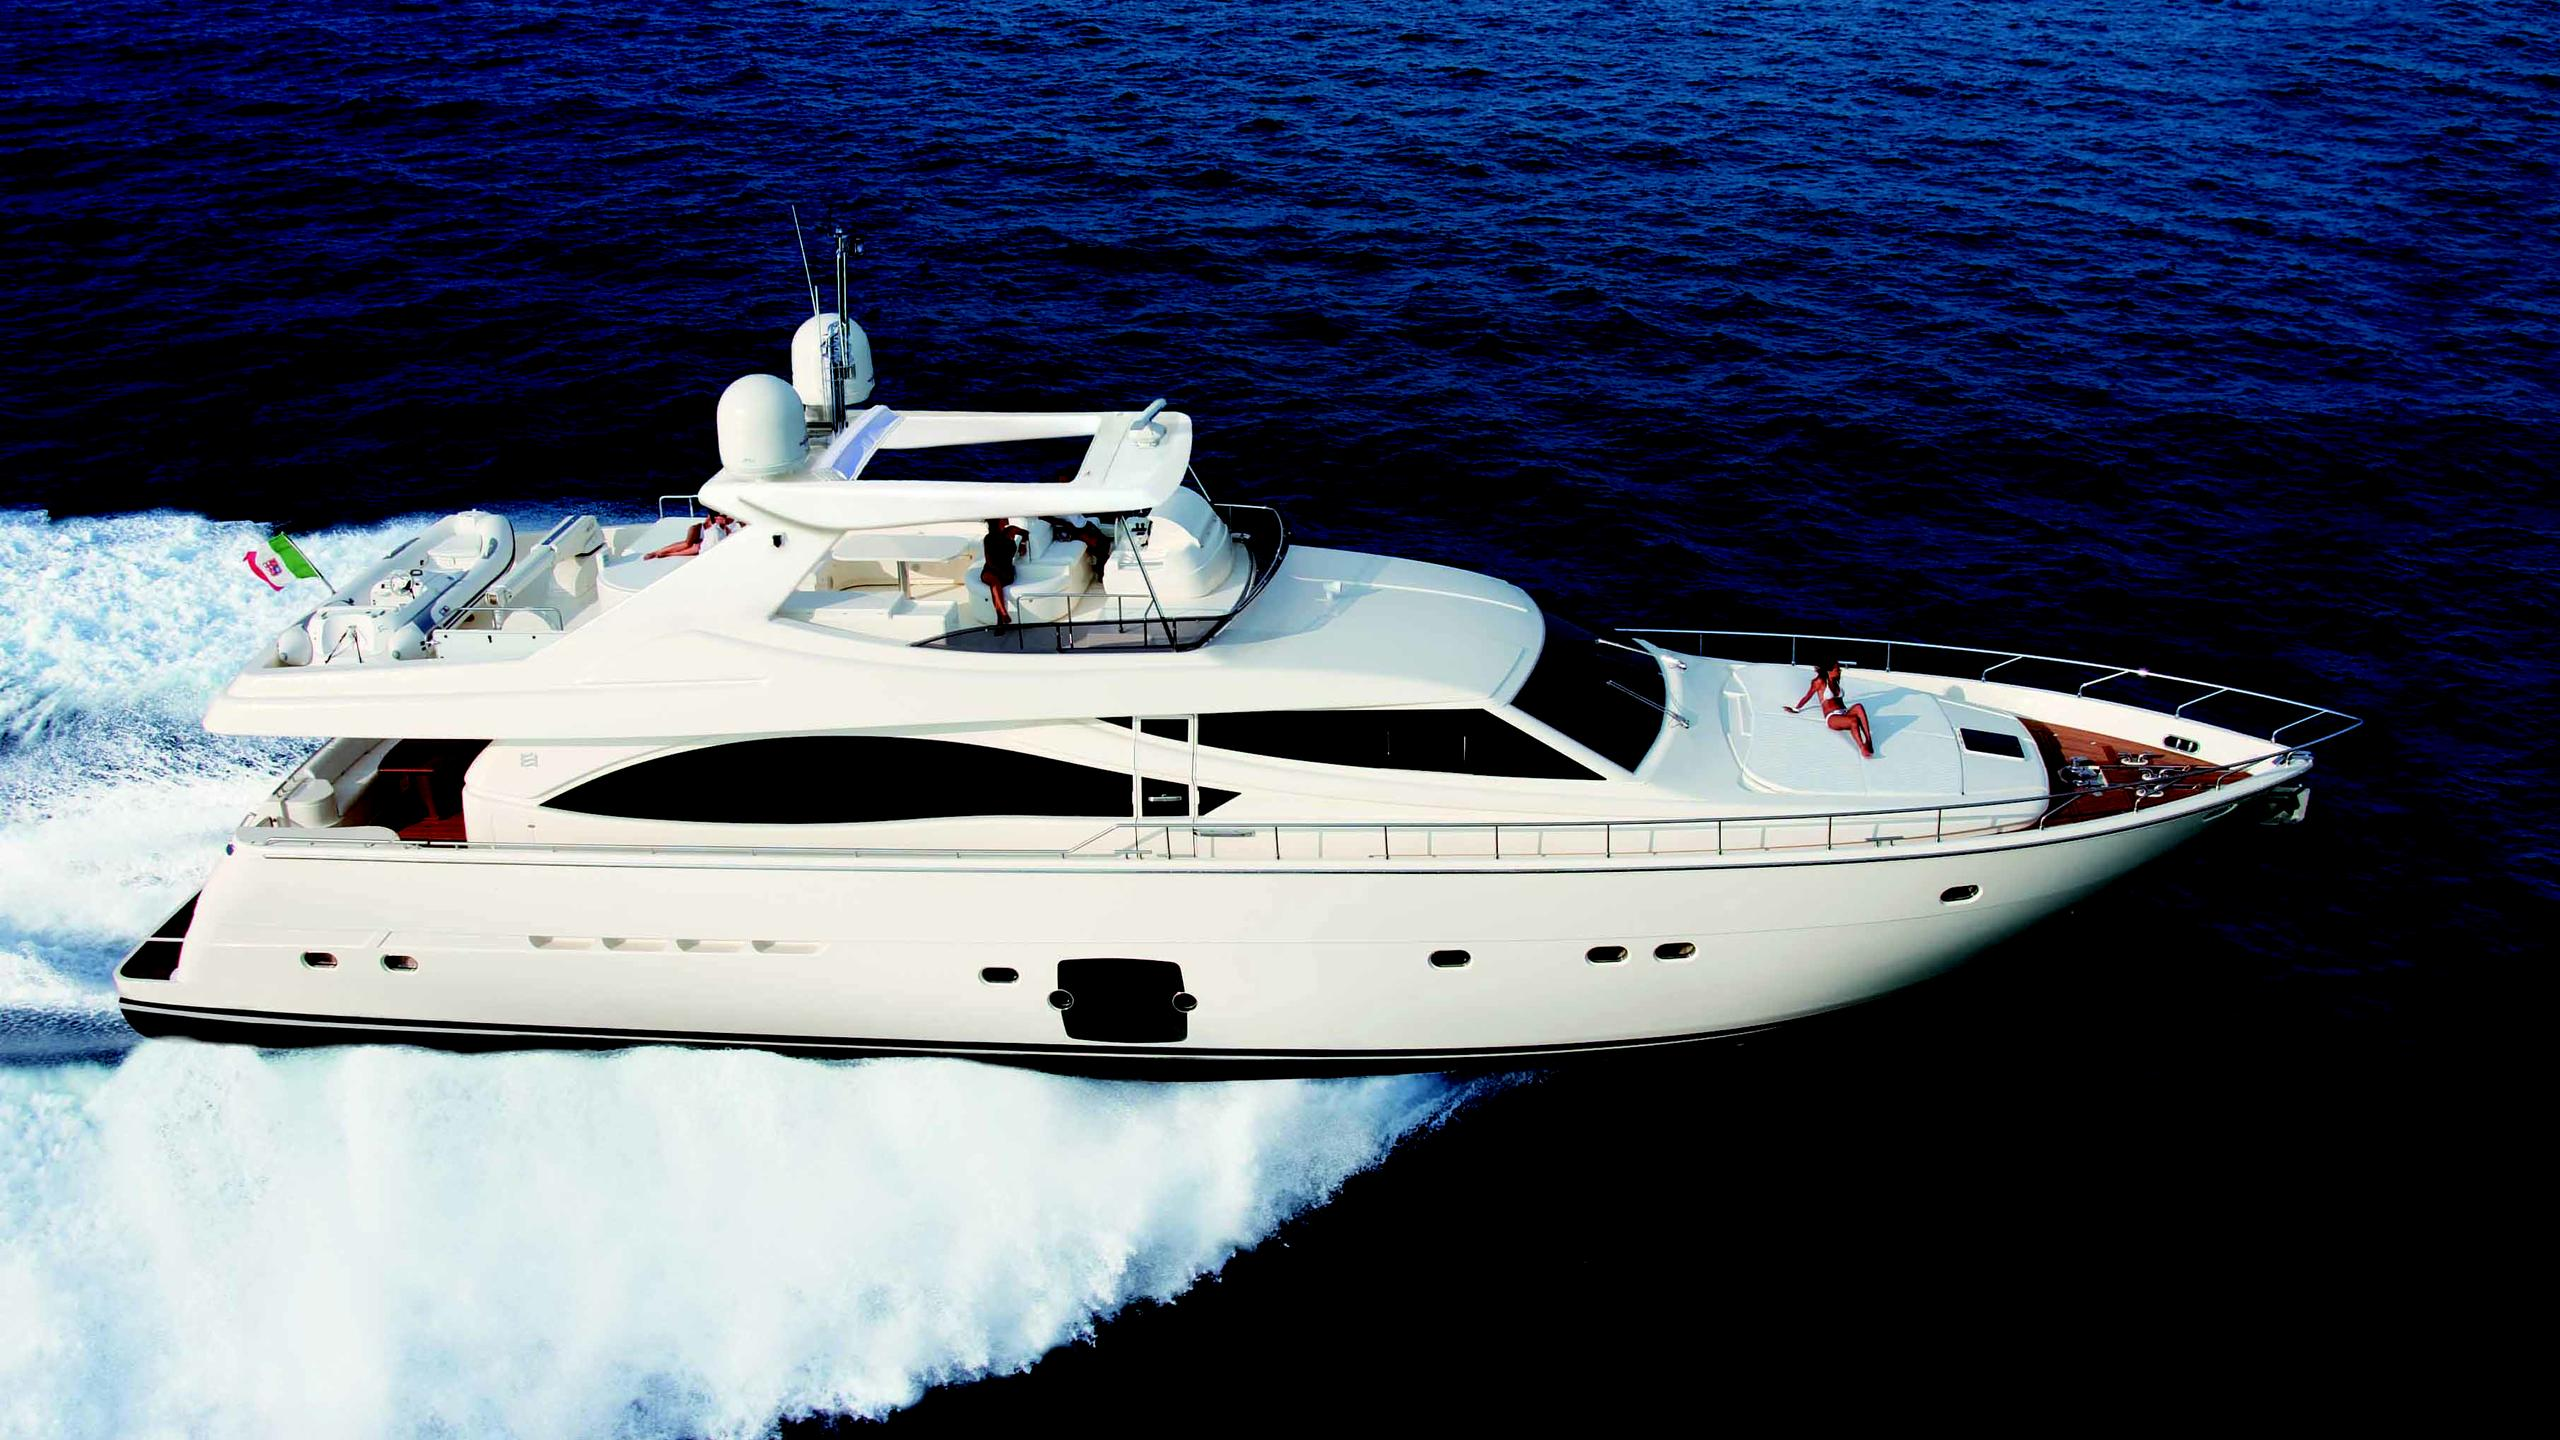 ferretti-830-06-motor-yacht-2005-25m-cruising